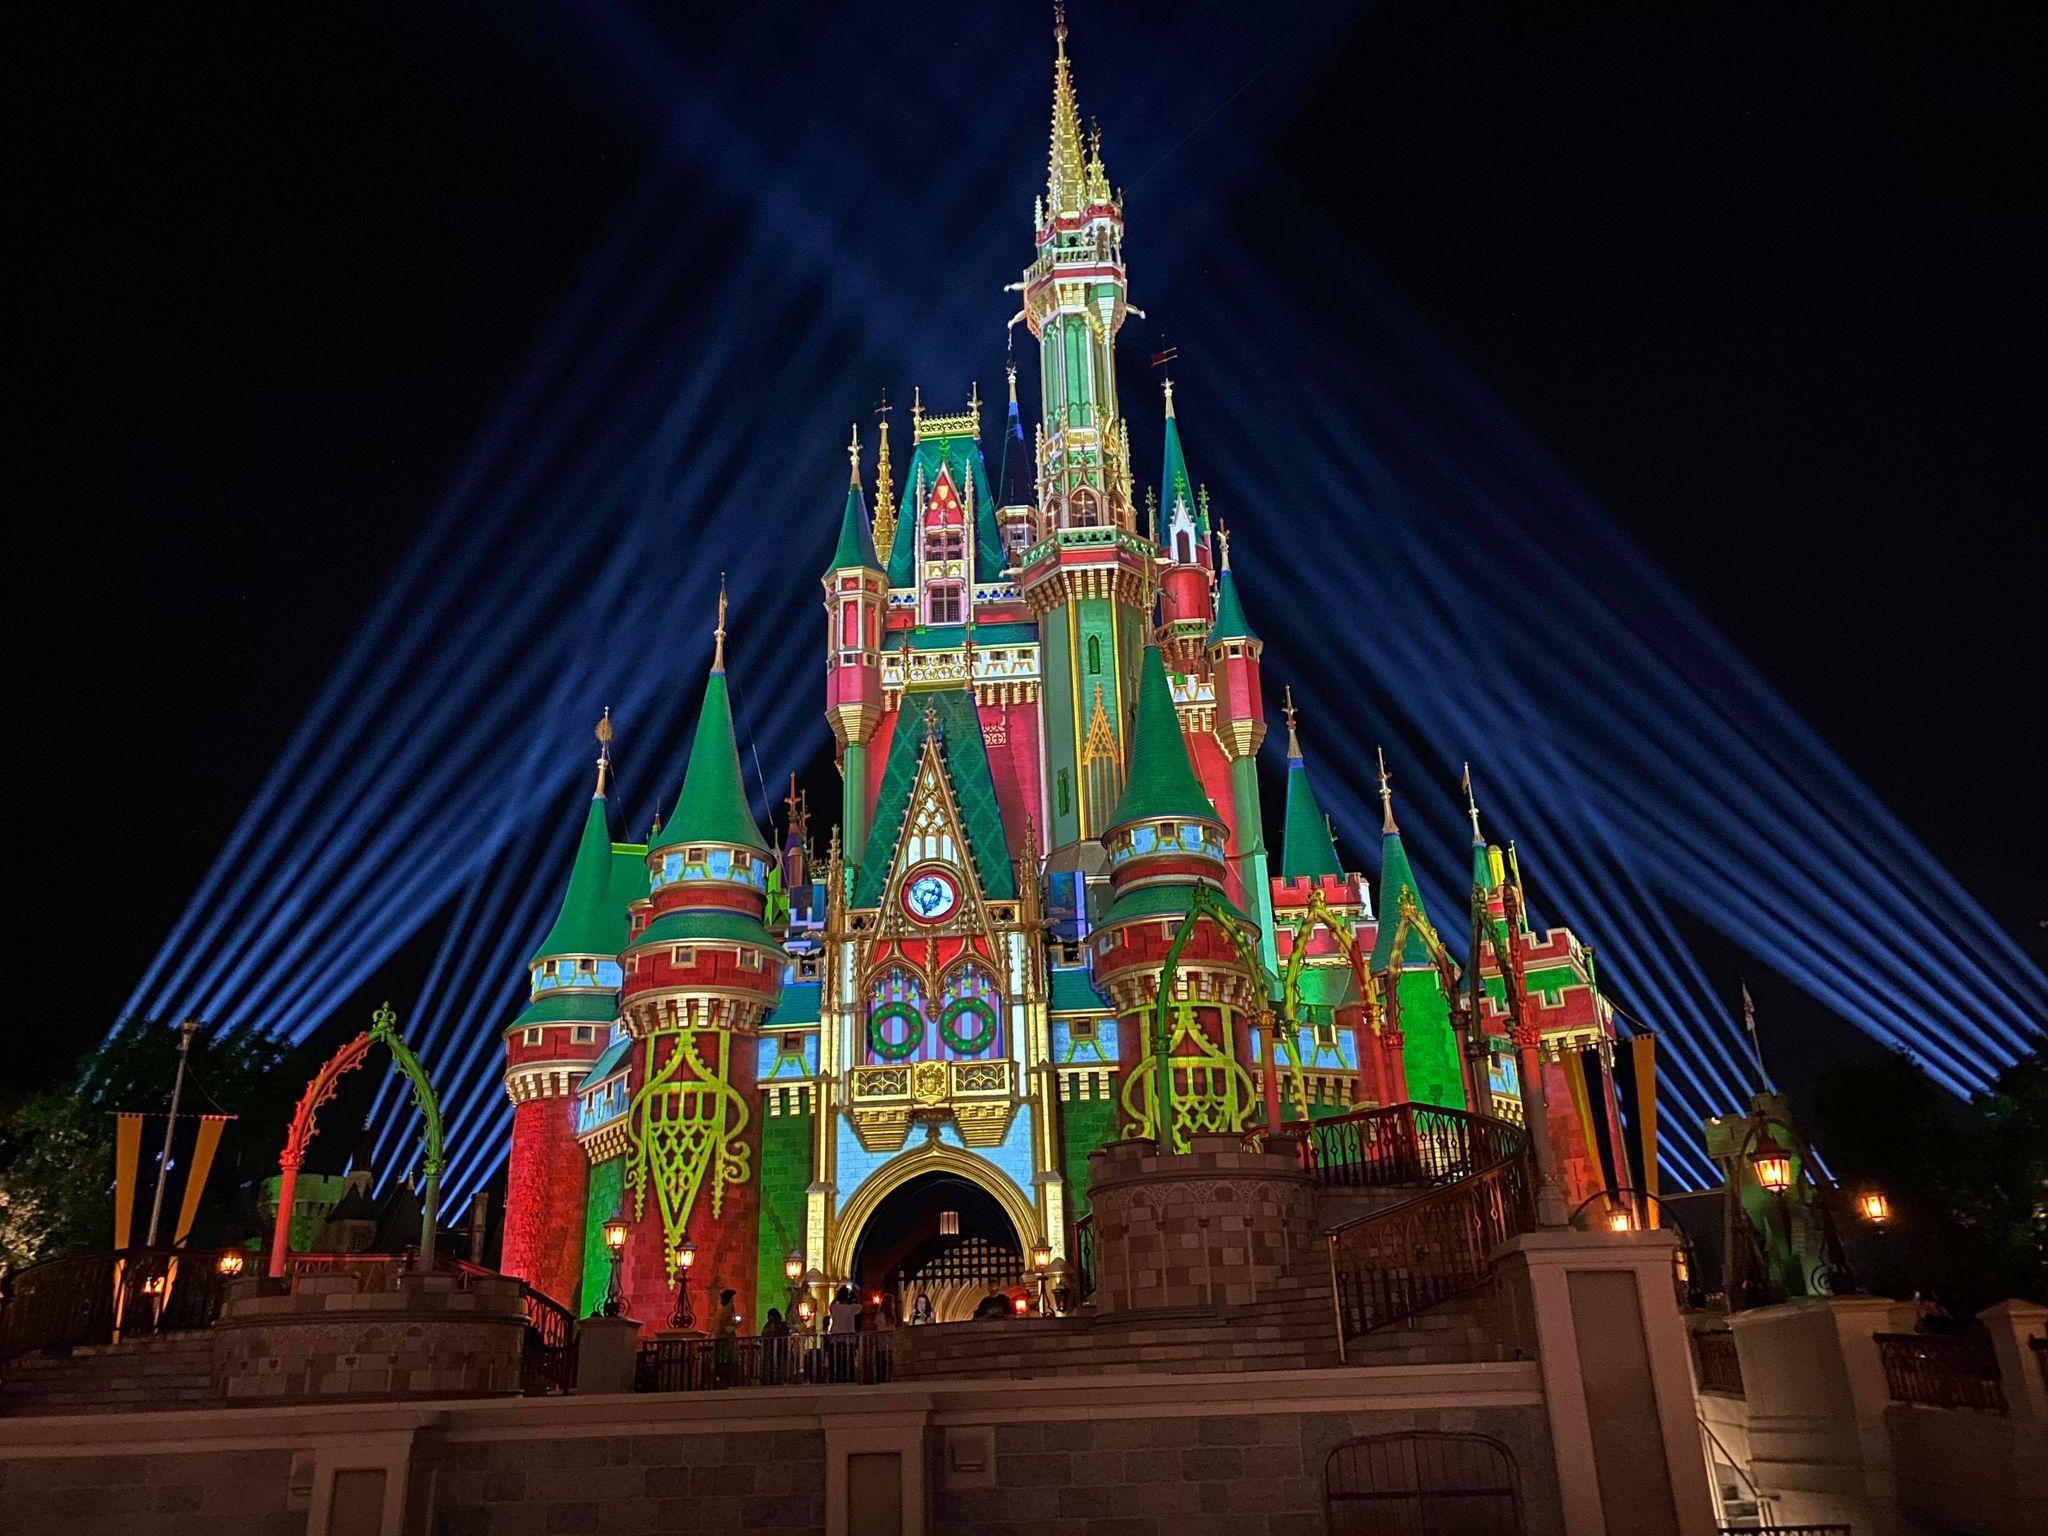 Disney Christmas 2021 Walt Disney World Christmas 2021 Decorations Festive Food Holiday Characters